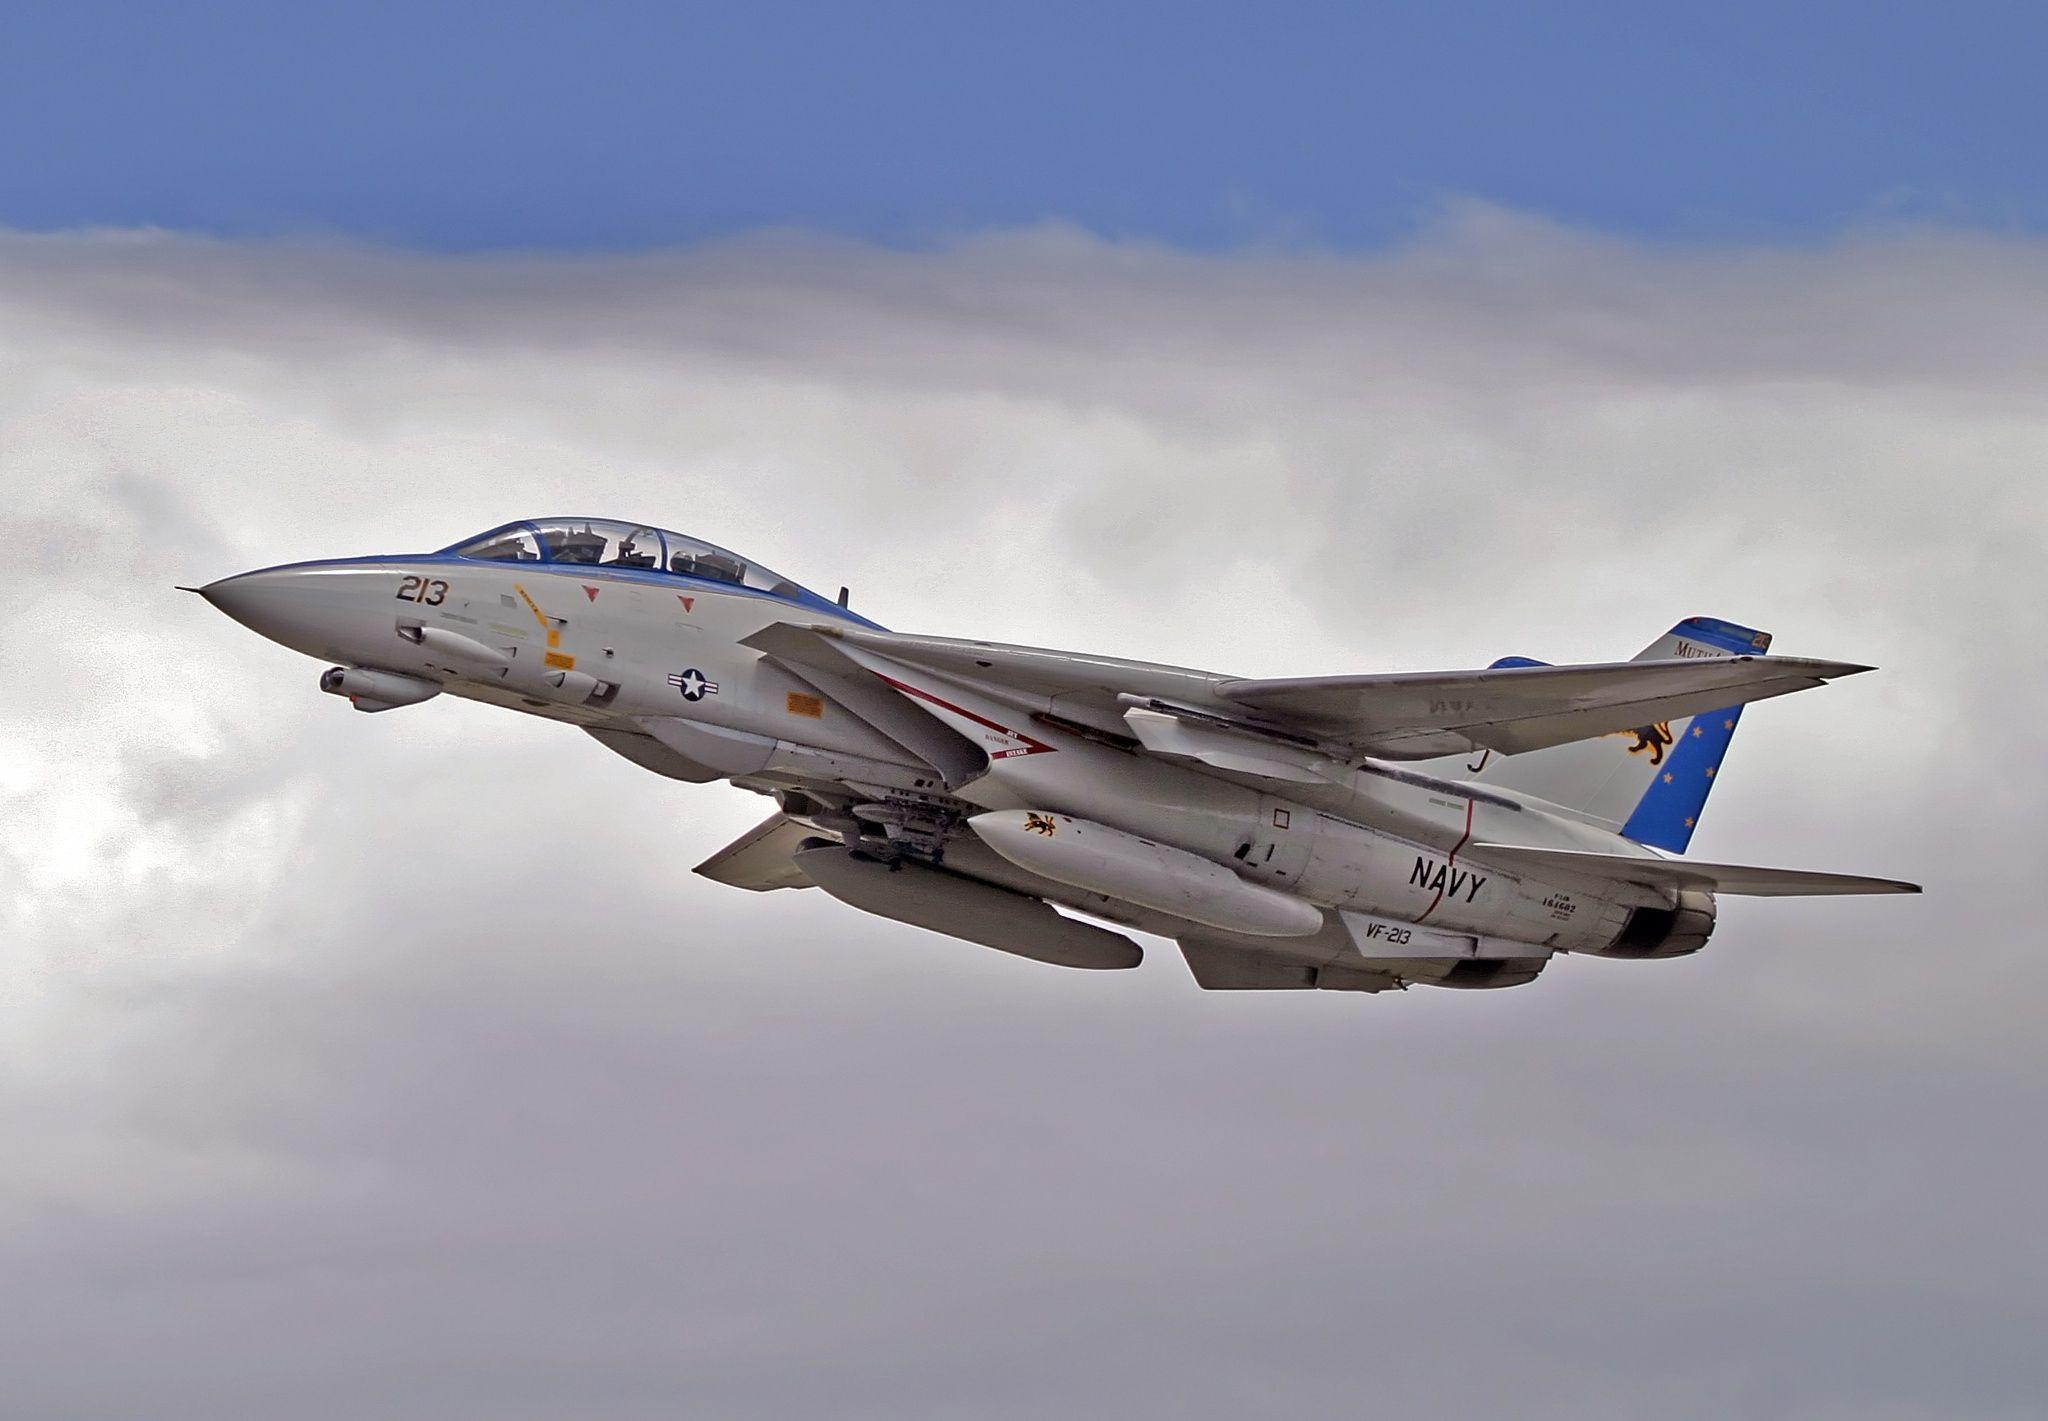 Final Fallon Tomcat Det F14D Tomcat near Naval Air